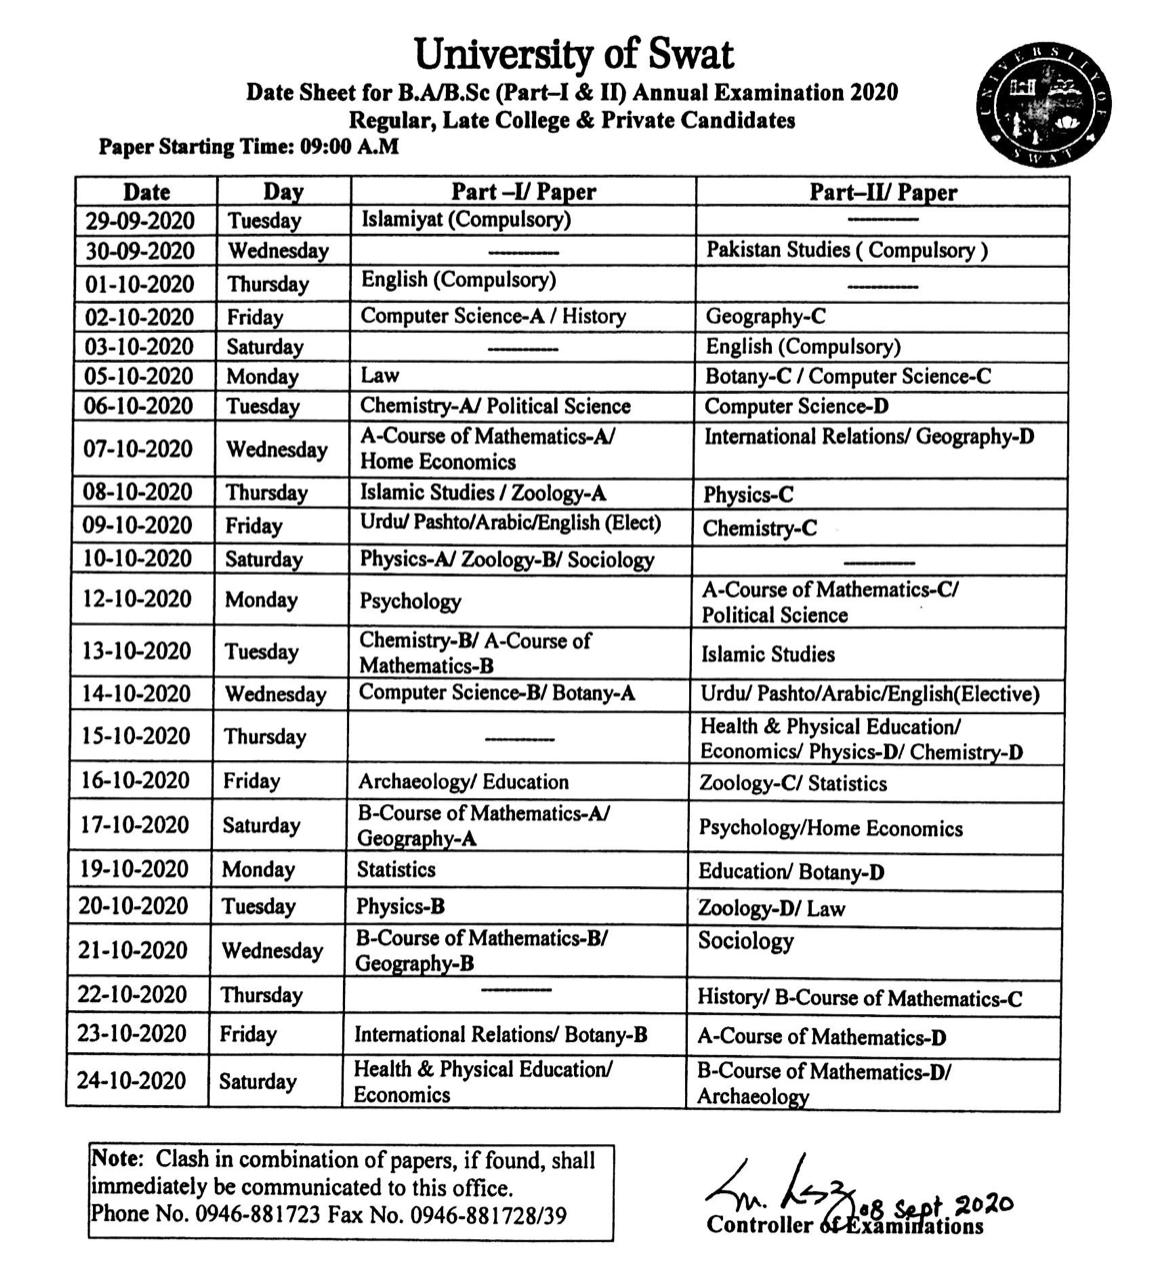 swat university ba bsc datesheet